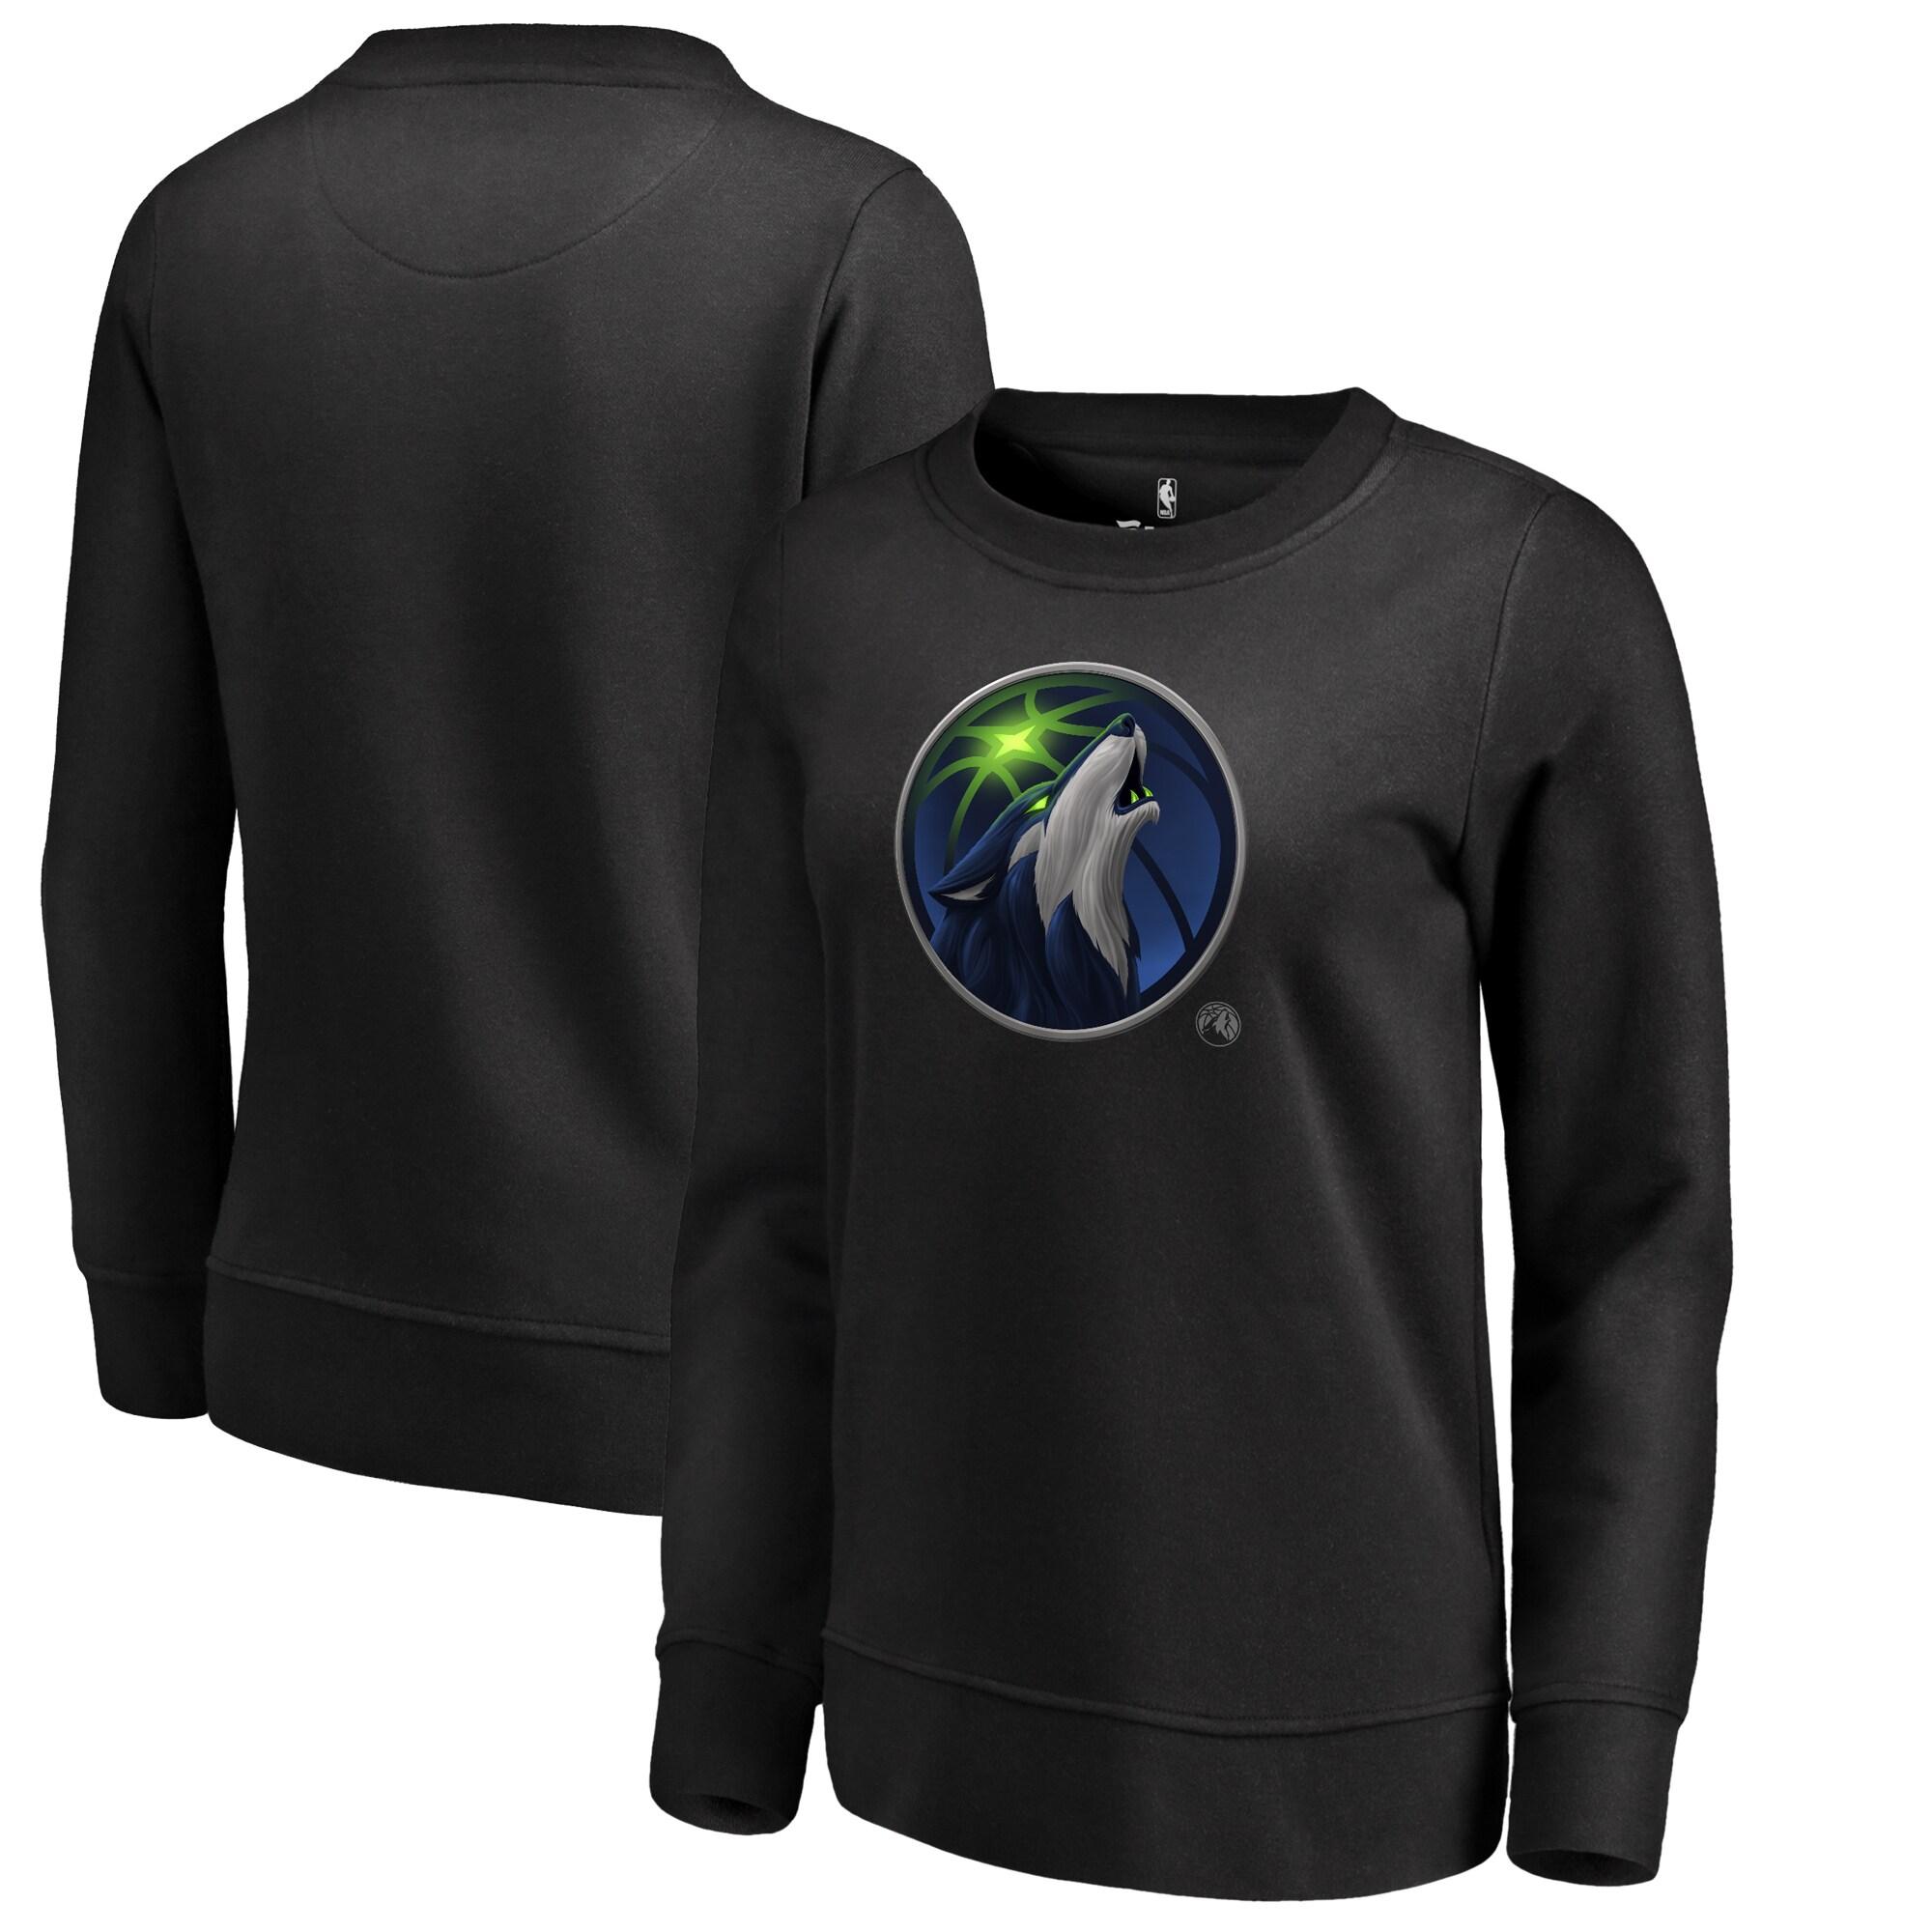 Minnesota Timberwolves Fanatics Branded Women's Midnight Mascot Pullover Sweatshirt - Black